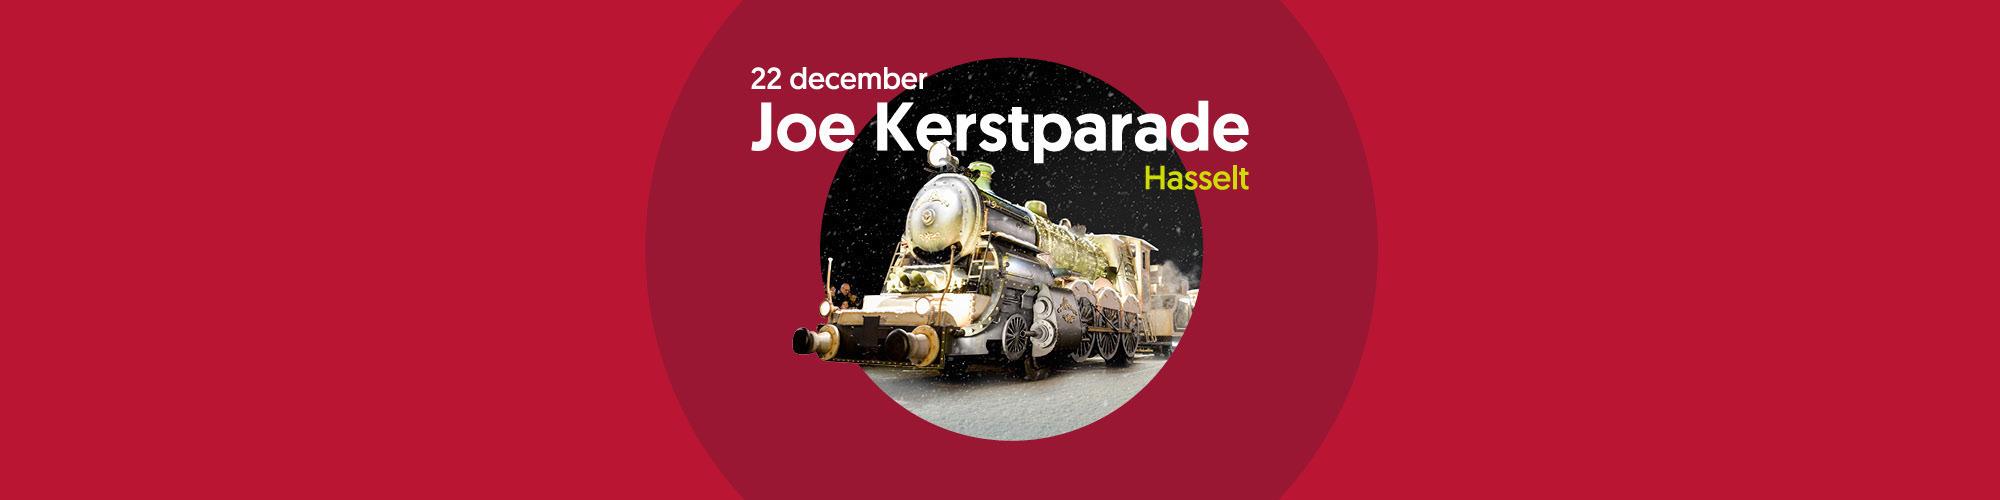 Joe kerstparade 2000x500